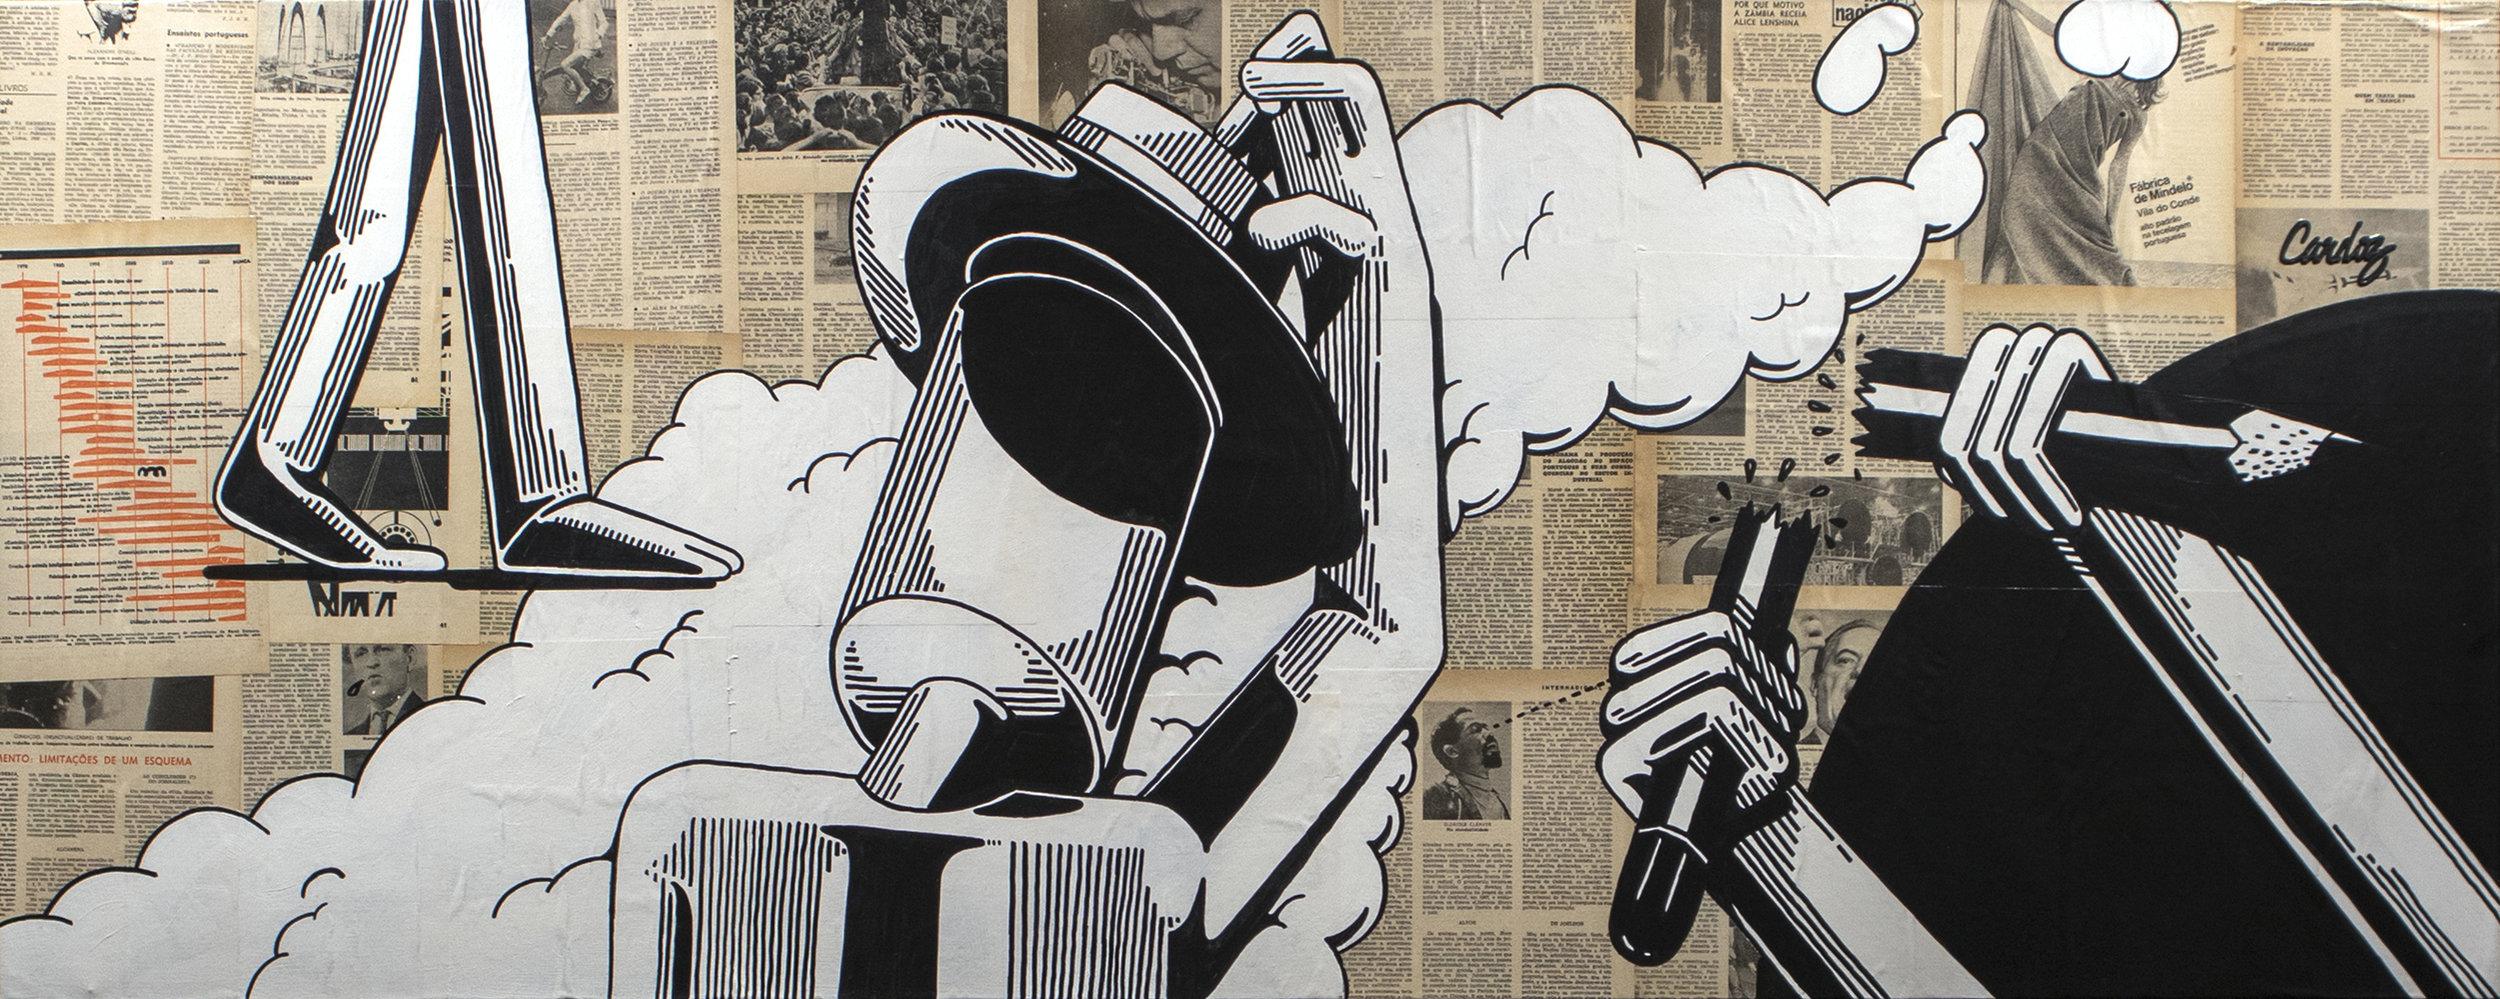 Stop showing off, 2019 Mixed technique - Collage + Illustration (Acrylic paint, Posca pen) 60 x 150 x 4,5 cm